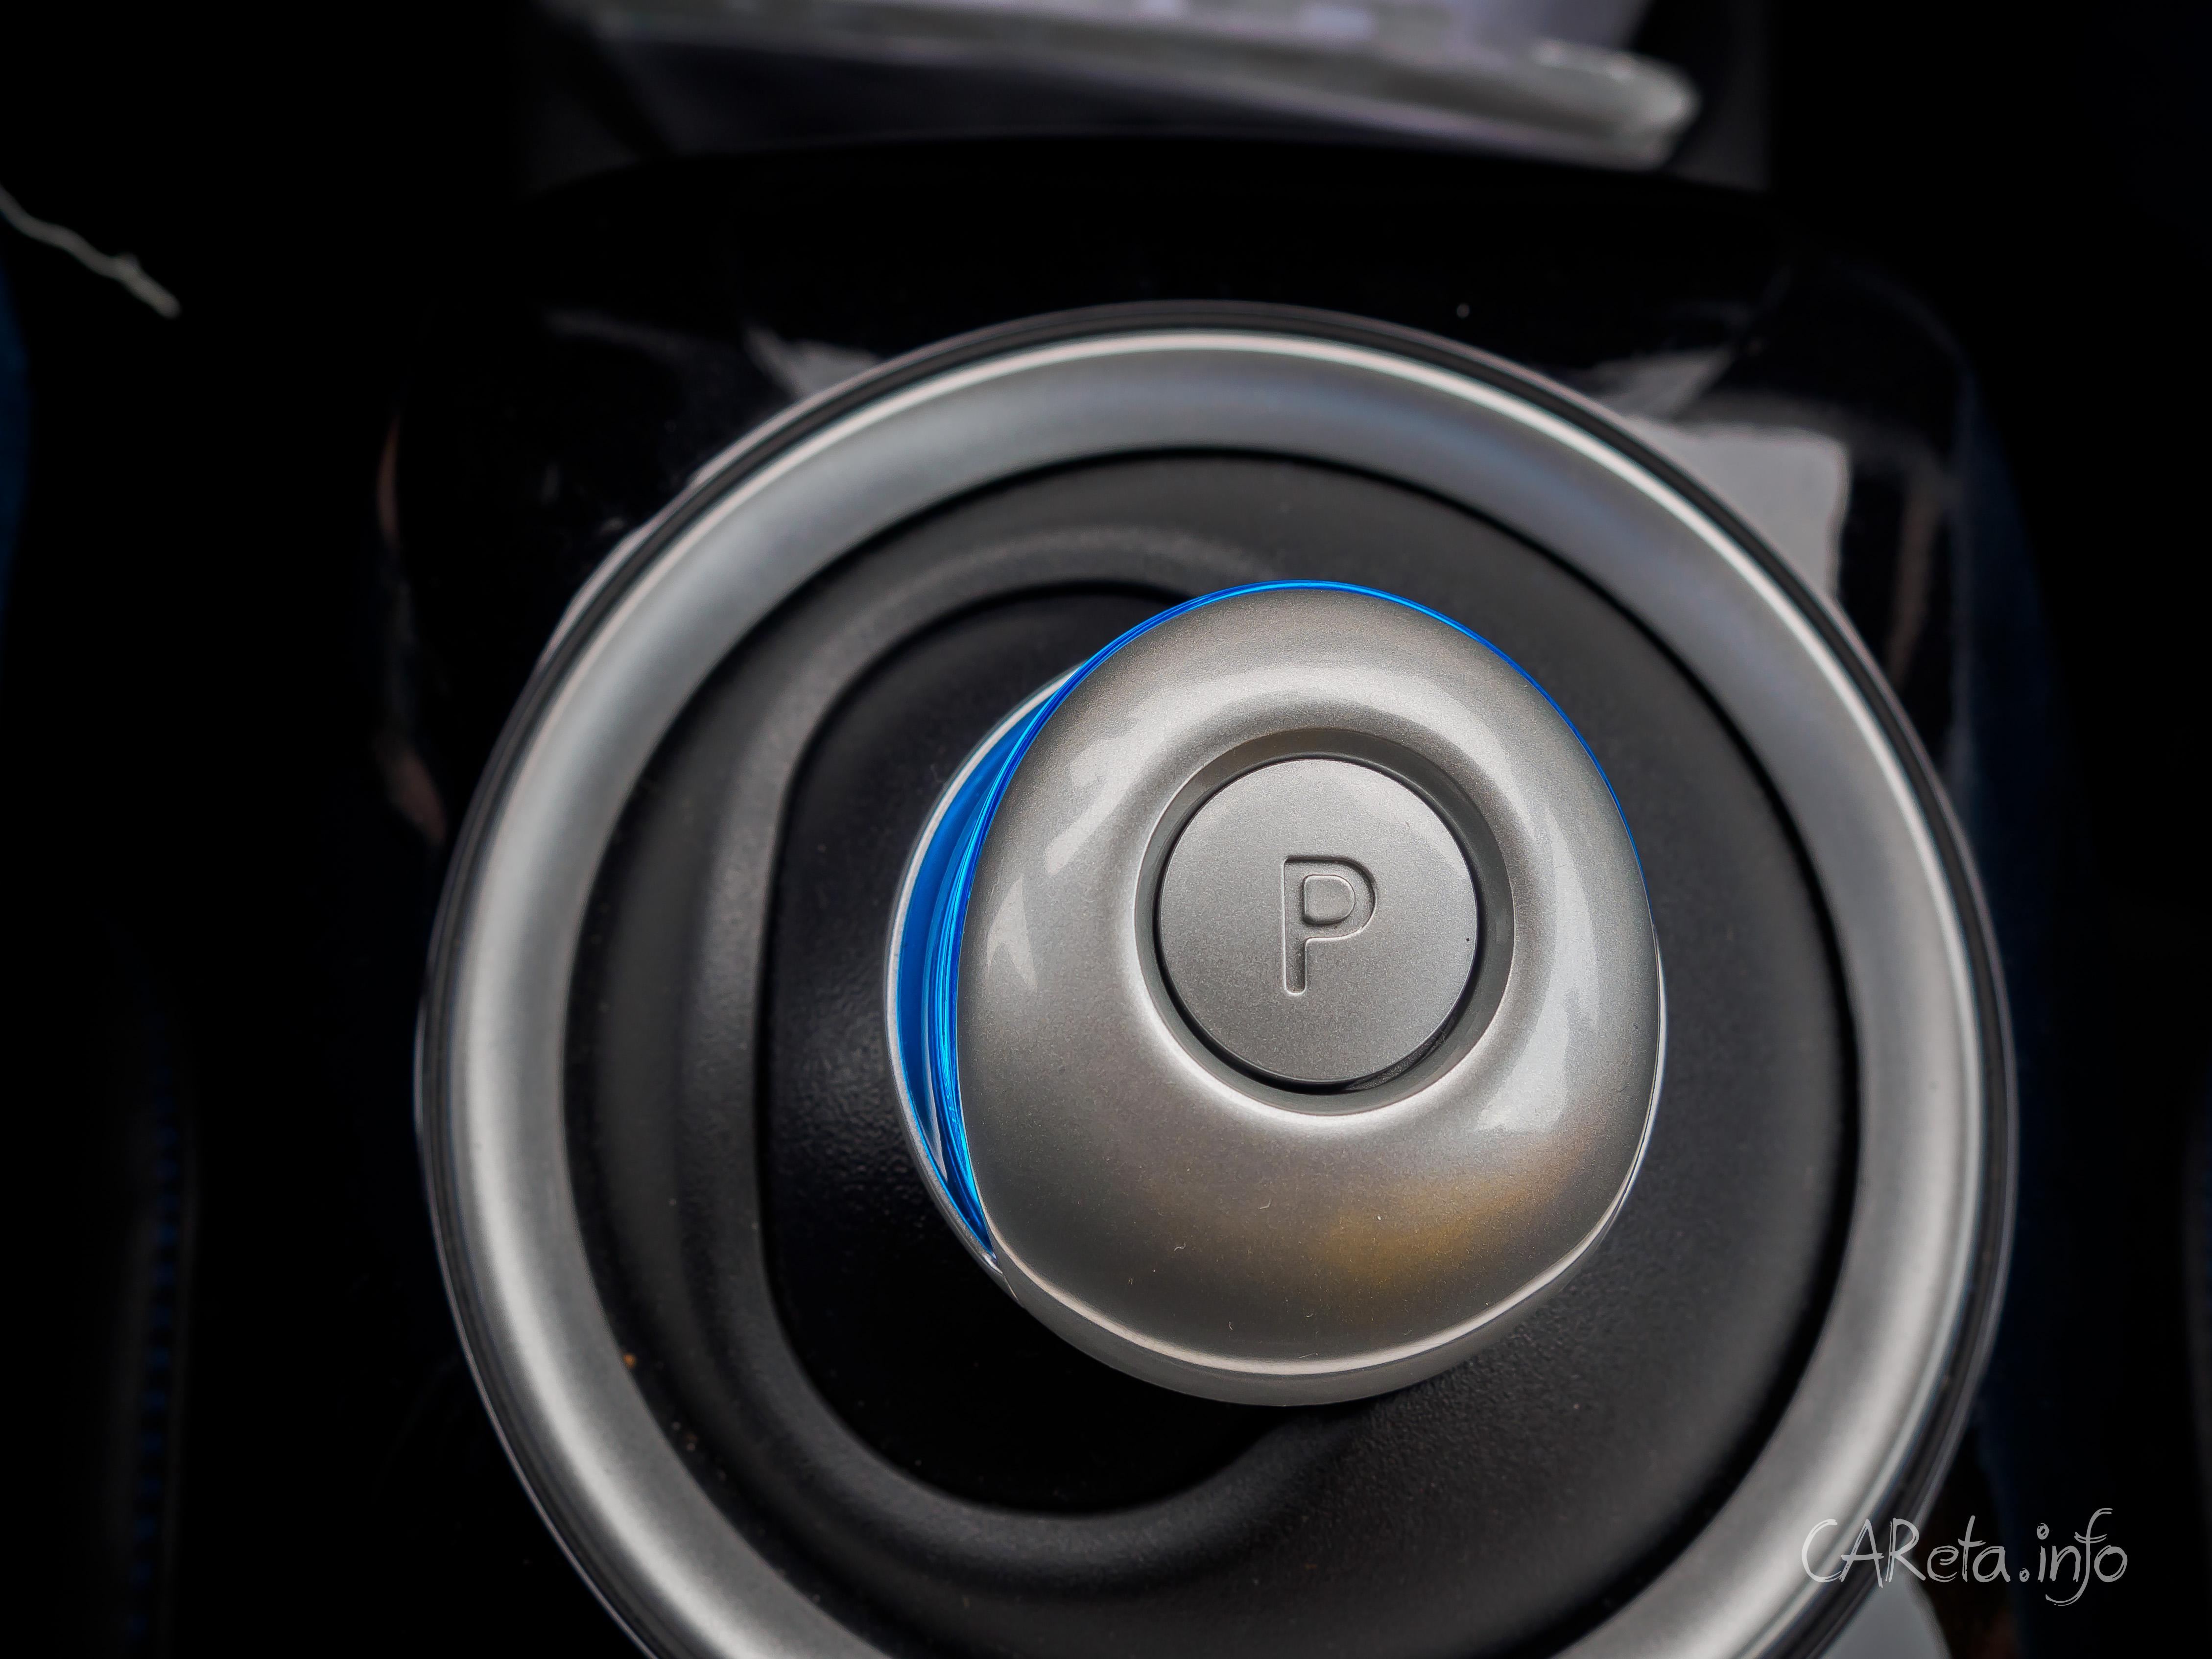 Заряжай. Катайся. Заряжай. Тест-драйв Nissan Leaf